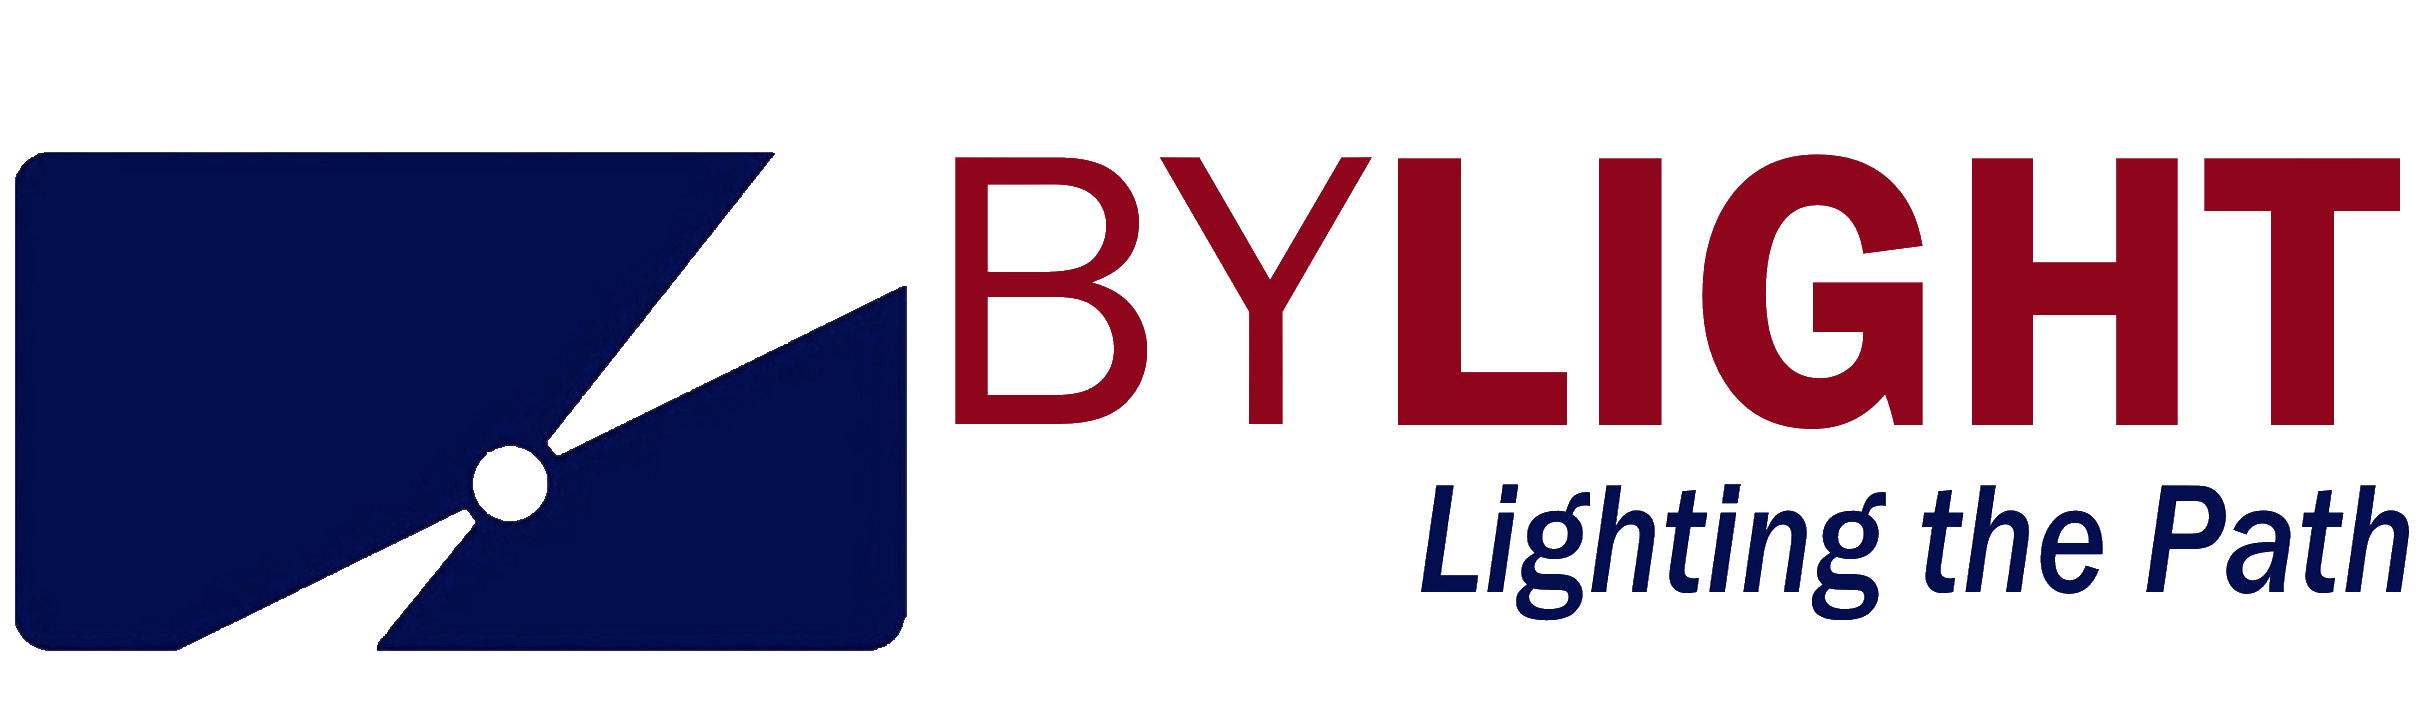 By Light Jobs